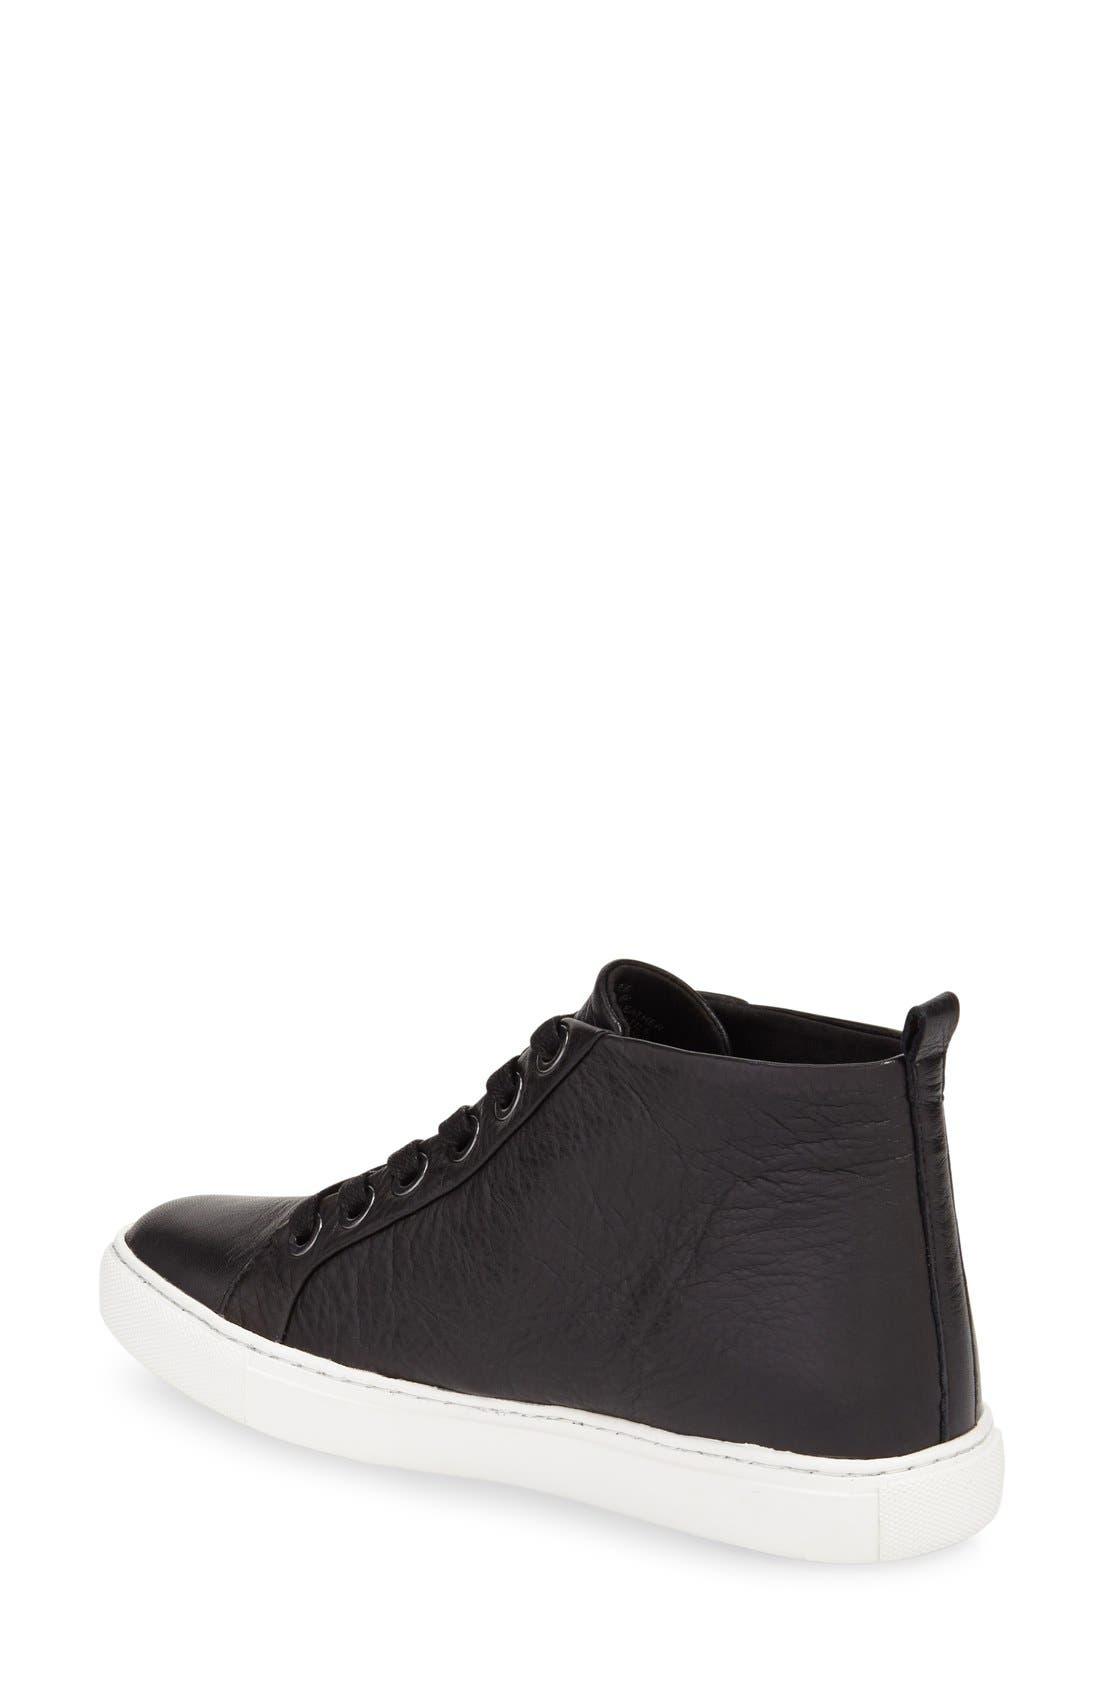 'Kaleb' High Top Sneaker,                             Alternate thumbnail 3, color,                             001